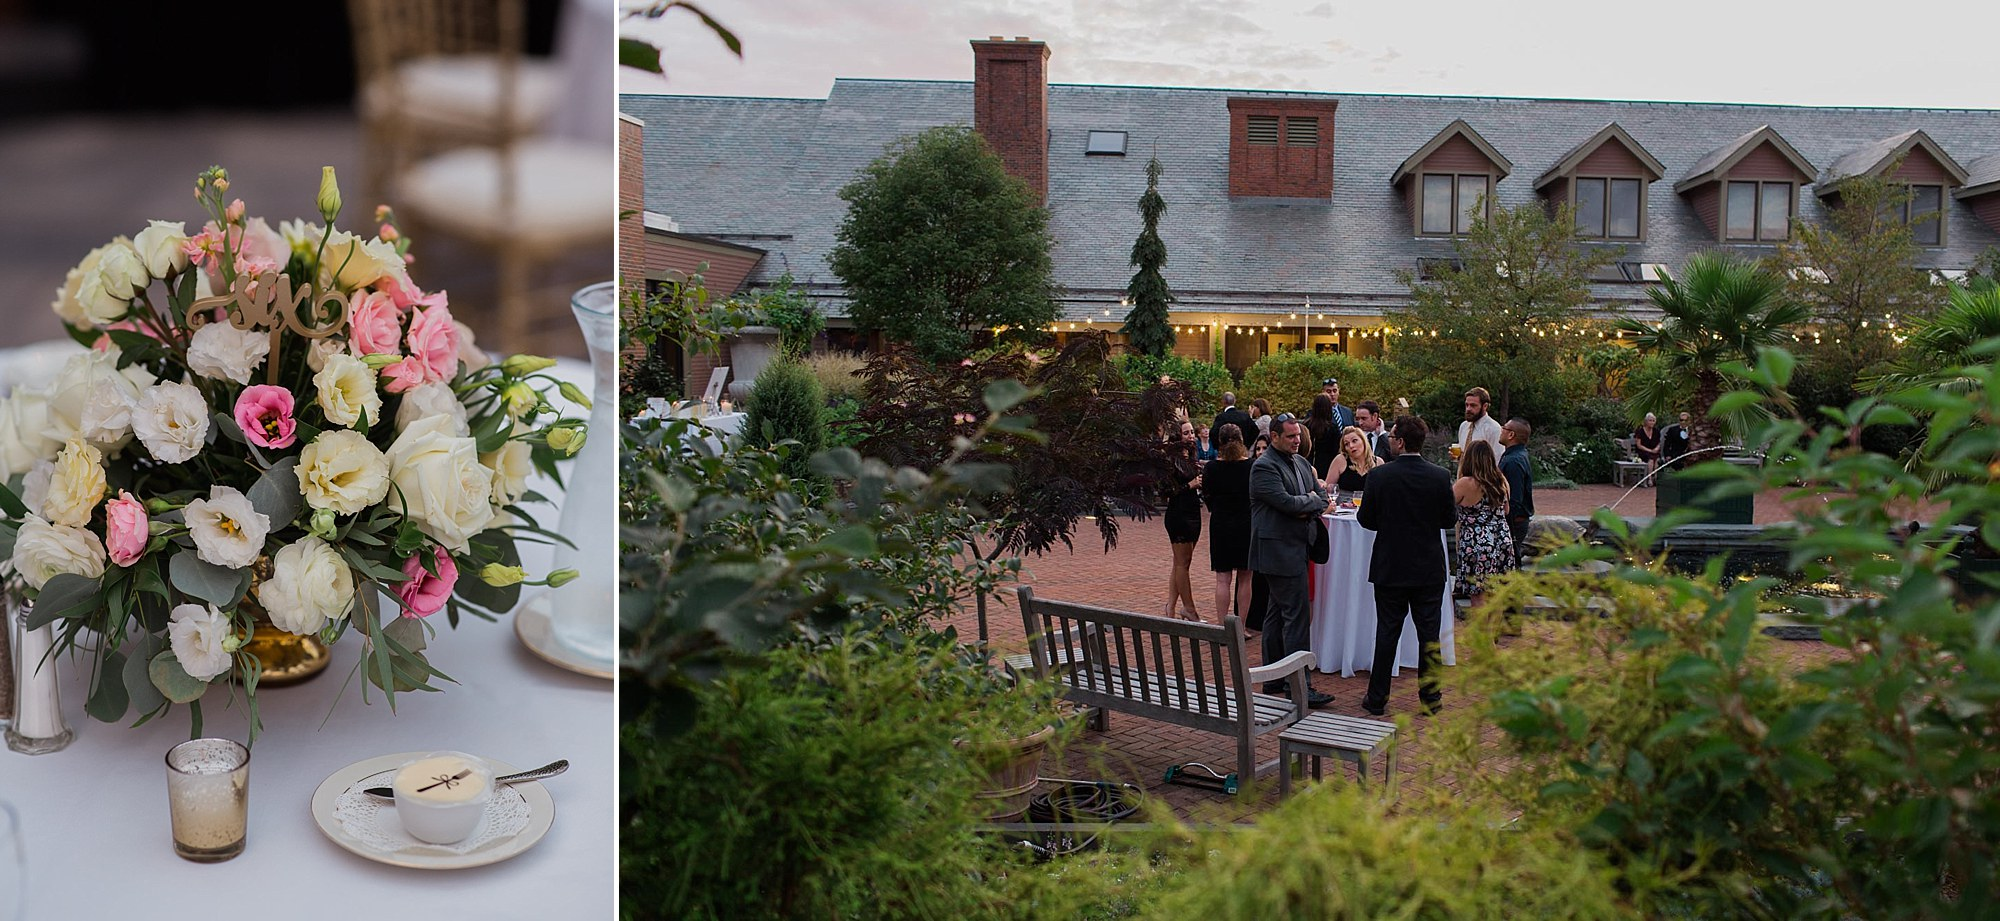 tower hill botanic garden Wedding-66.jpg